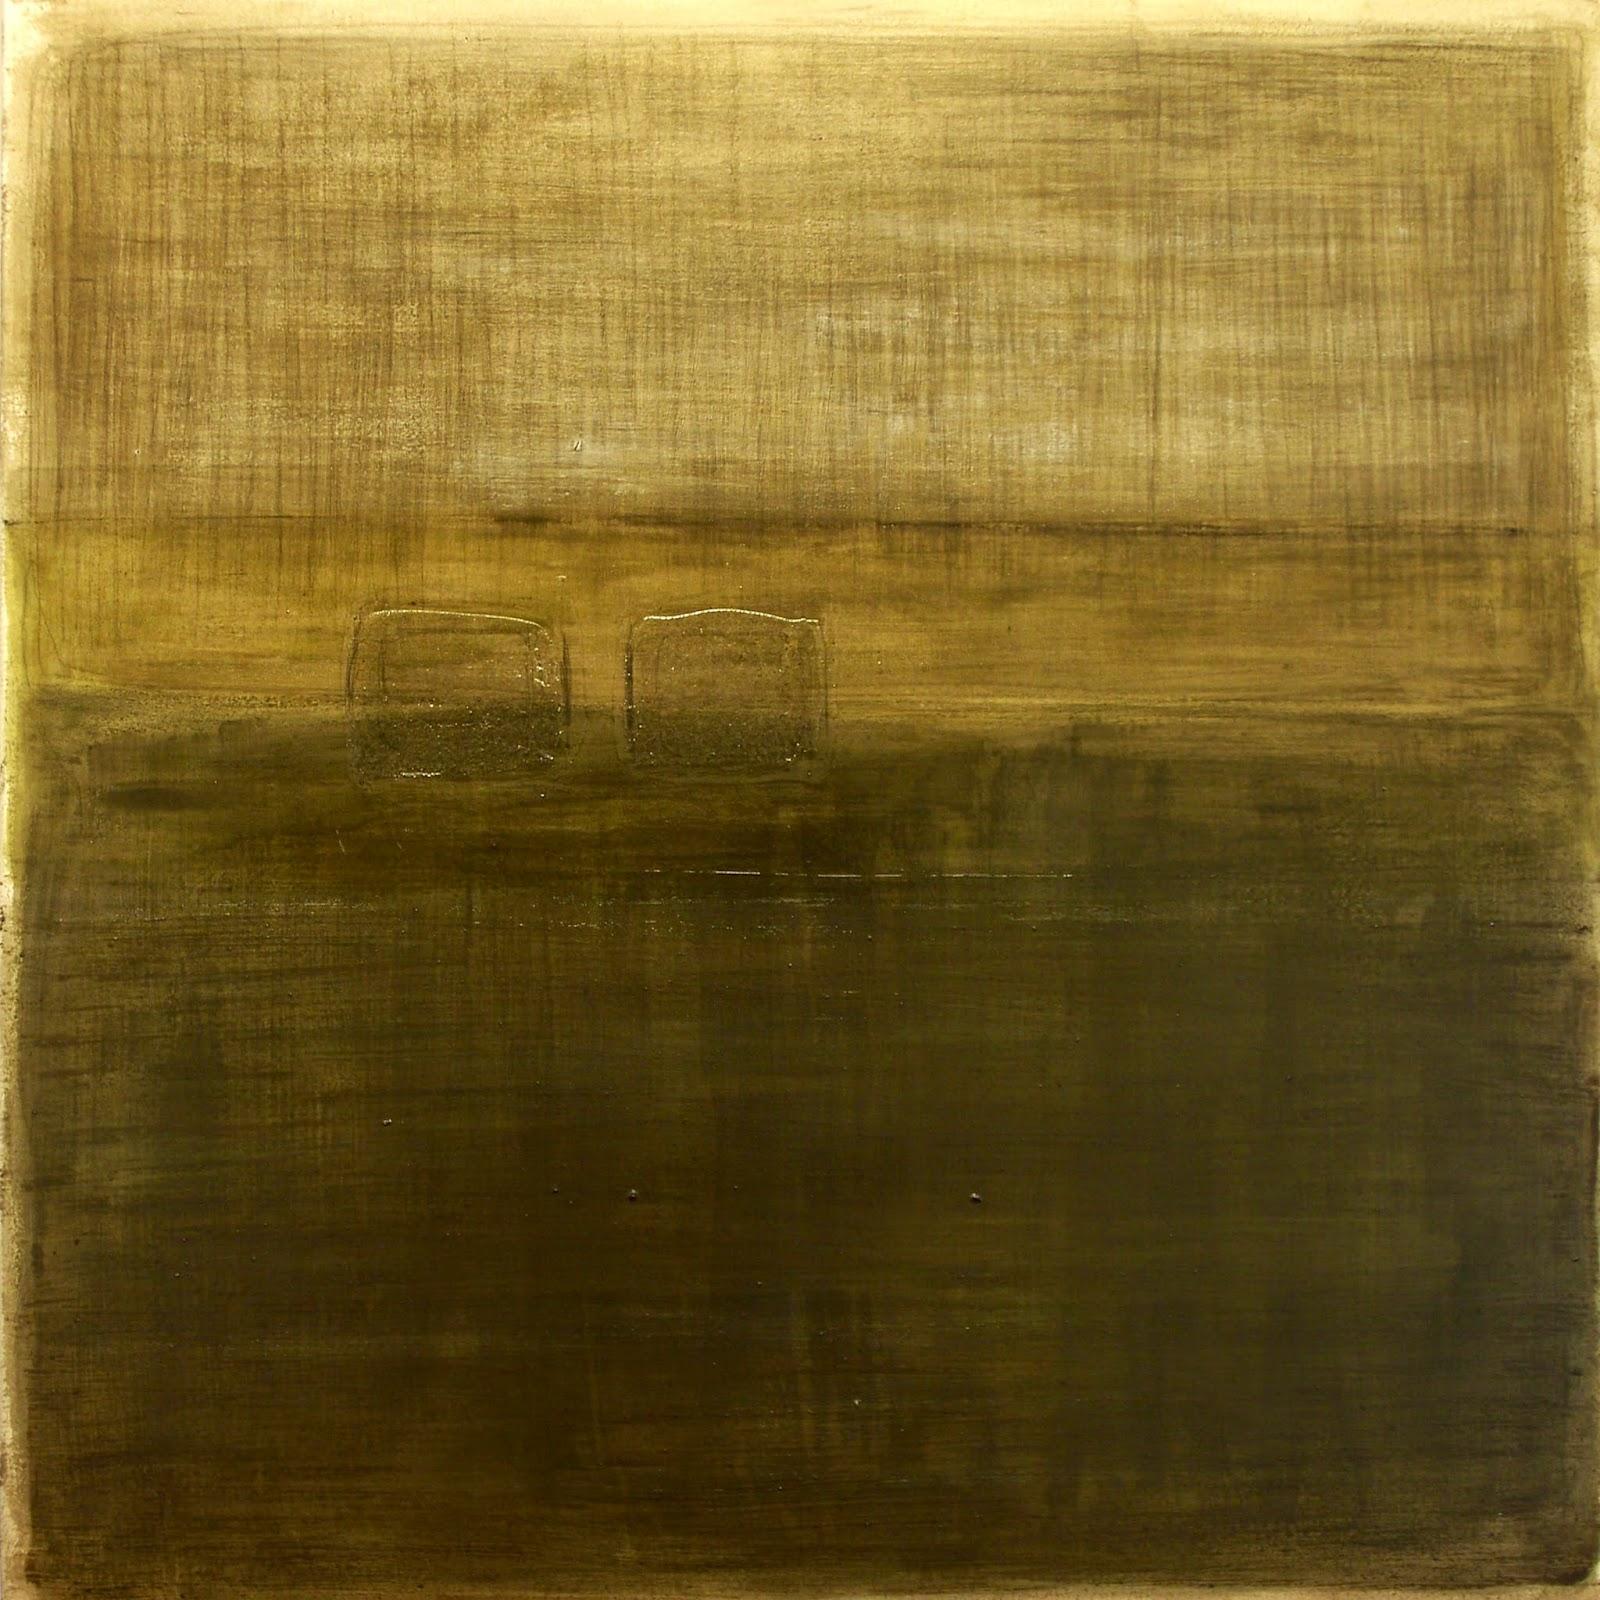 Pinturas Abstractas De Vanina Martinez Tecnicas Mixtas - Cuadros-en-relieve-modernos